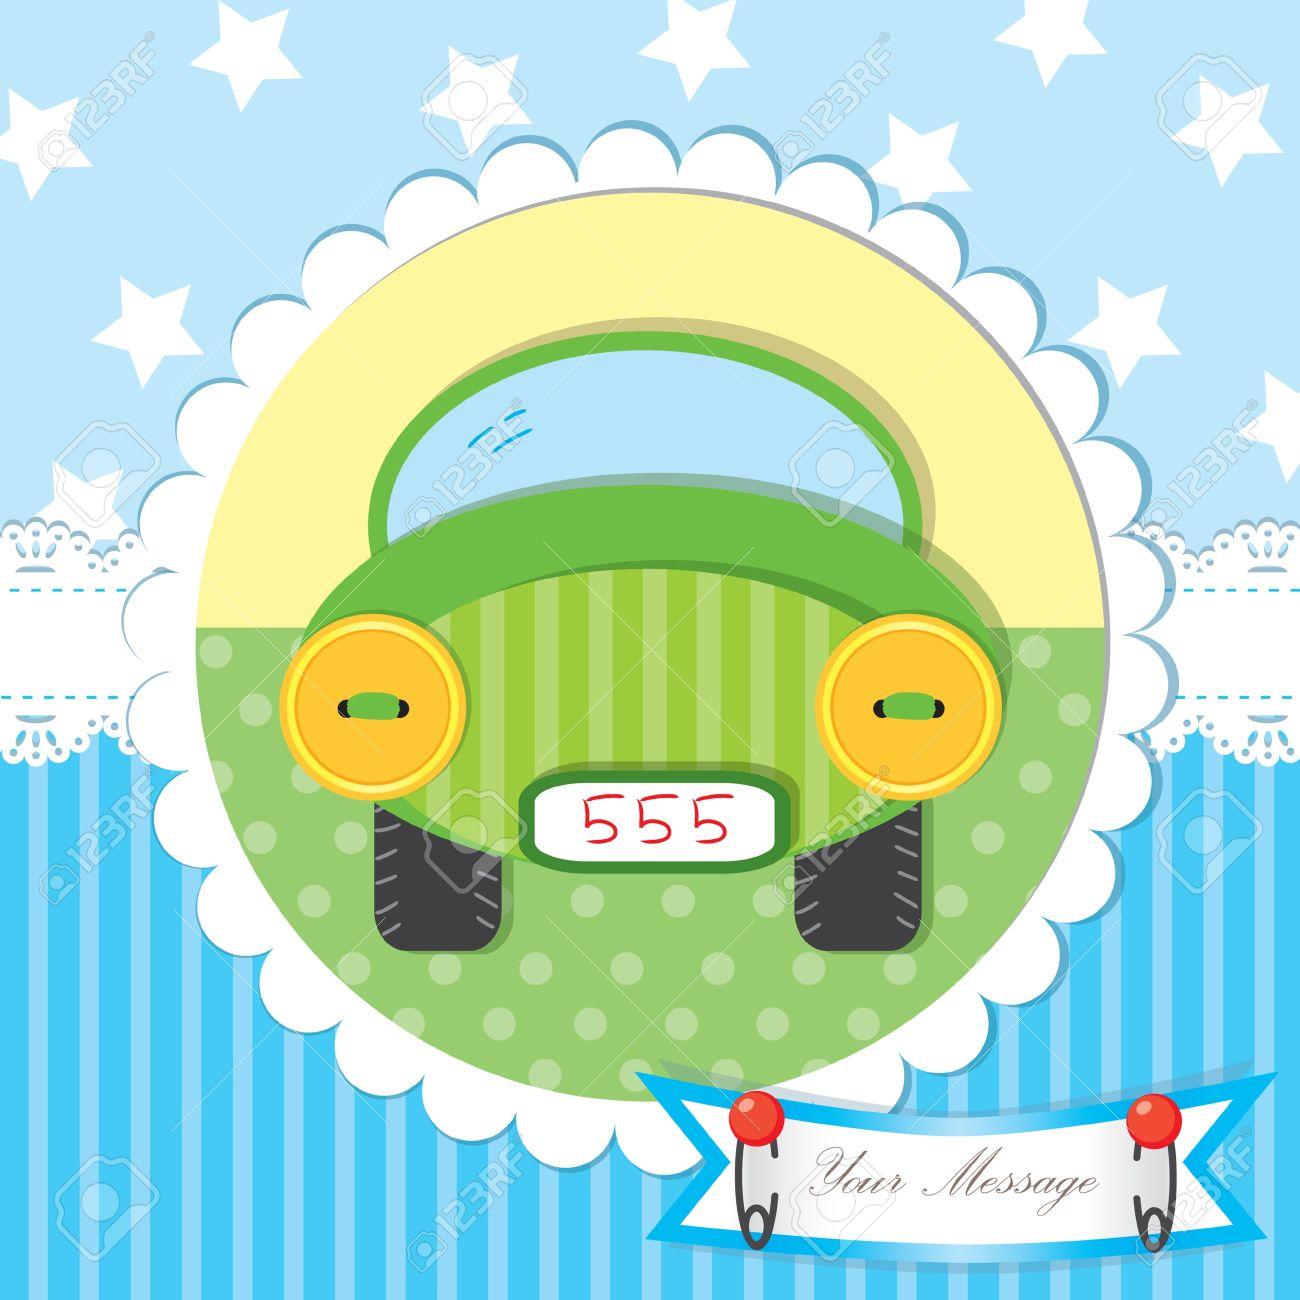 Cute baby shower and scrapbook Stock Vector - 15103181